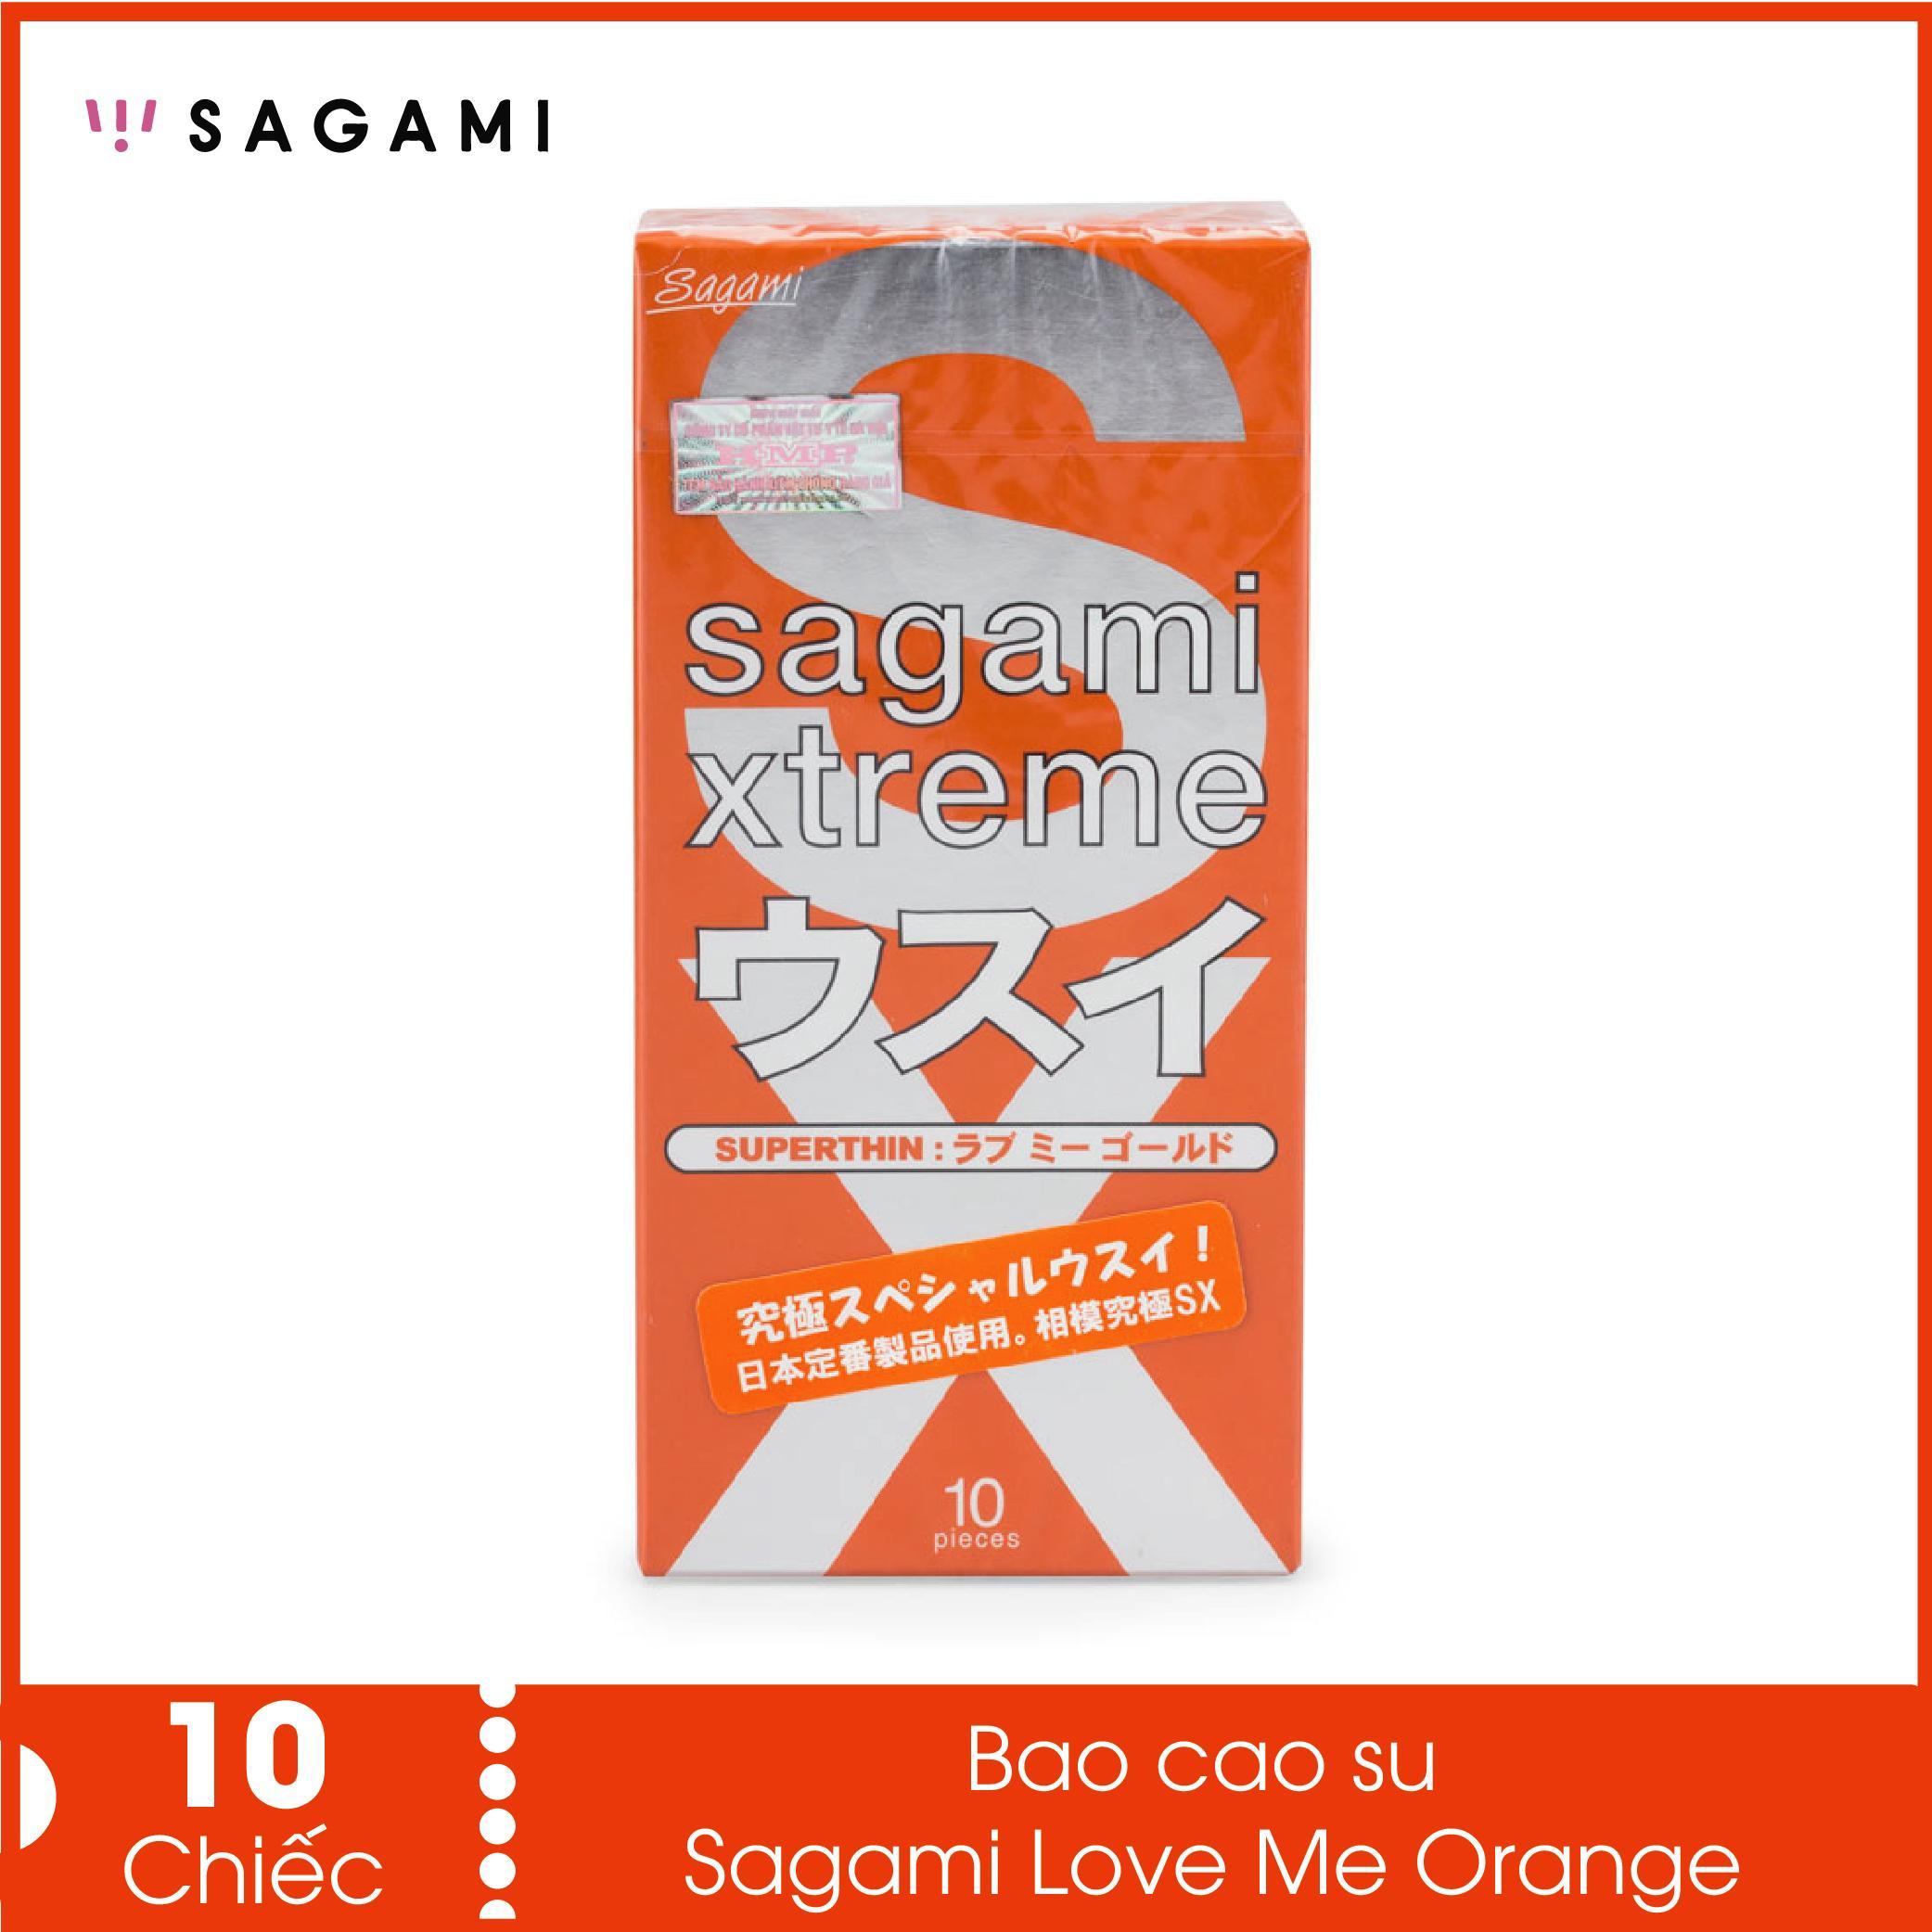 Bao cao su Sagami Love Me Orange (Hộp 10 chiếc) - truyền nhiệt nhanh,siêu mỏng